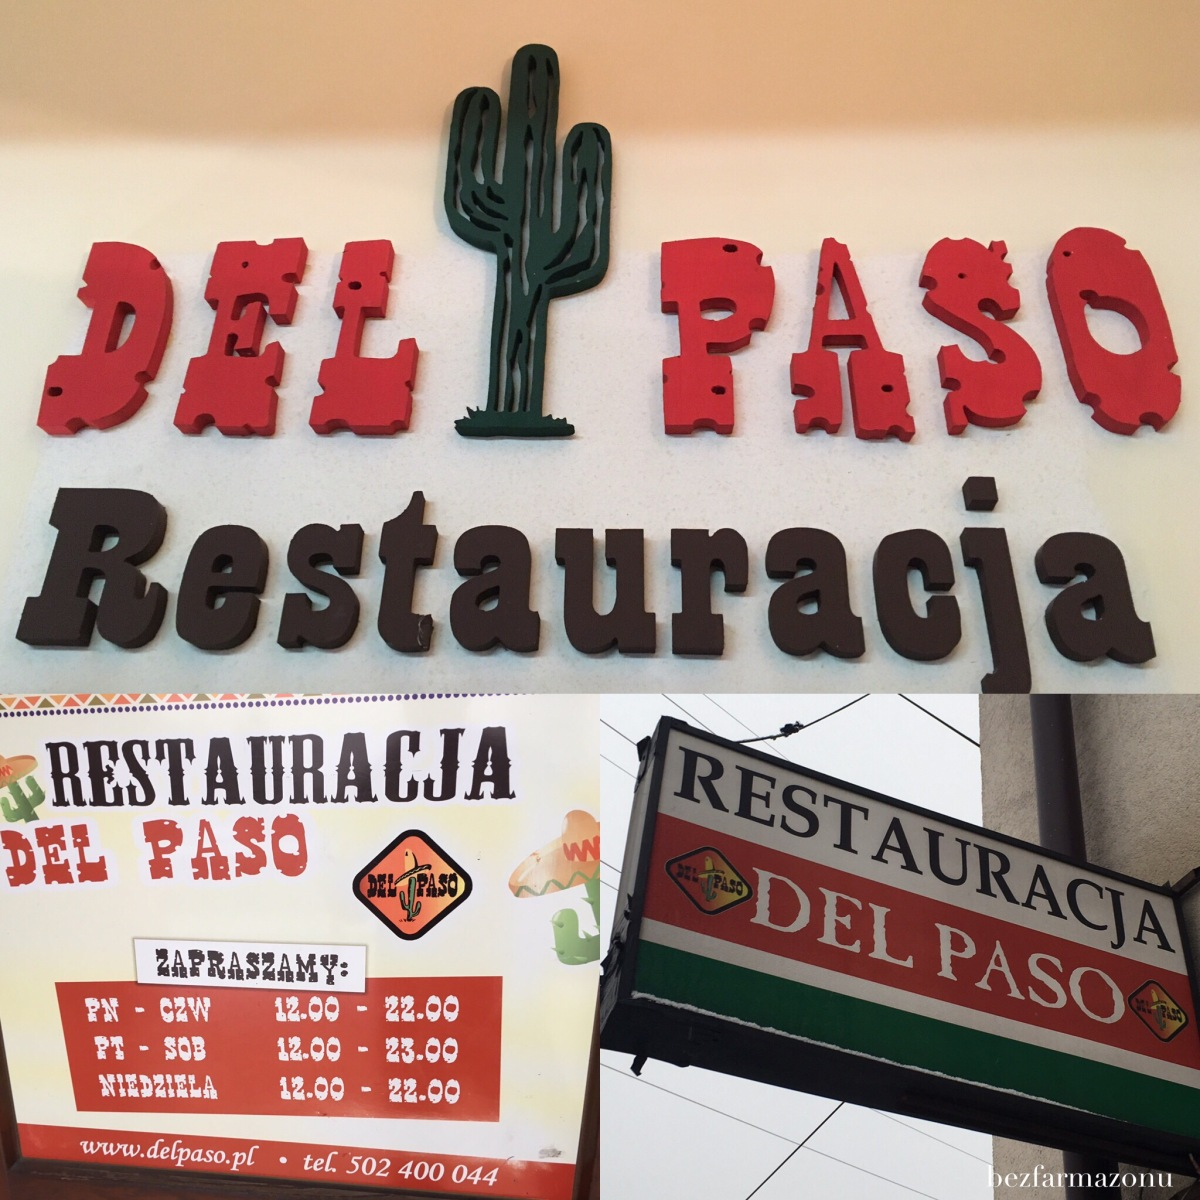 Ale Meksyk! - Restauracja Del Paso - Trzebinia